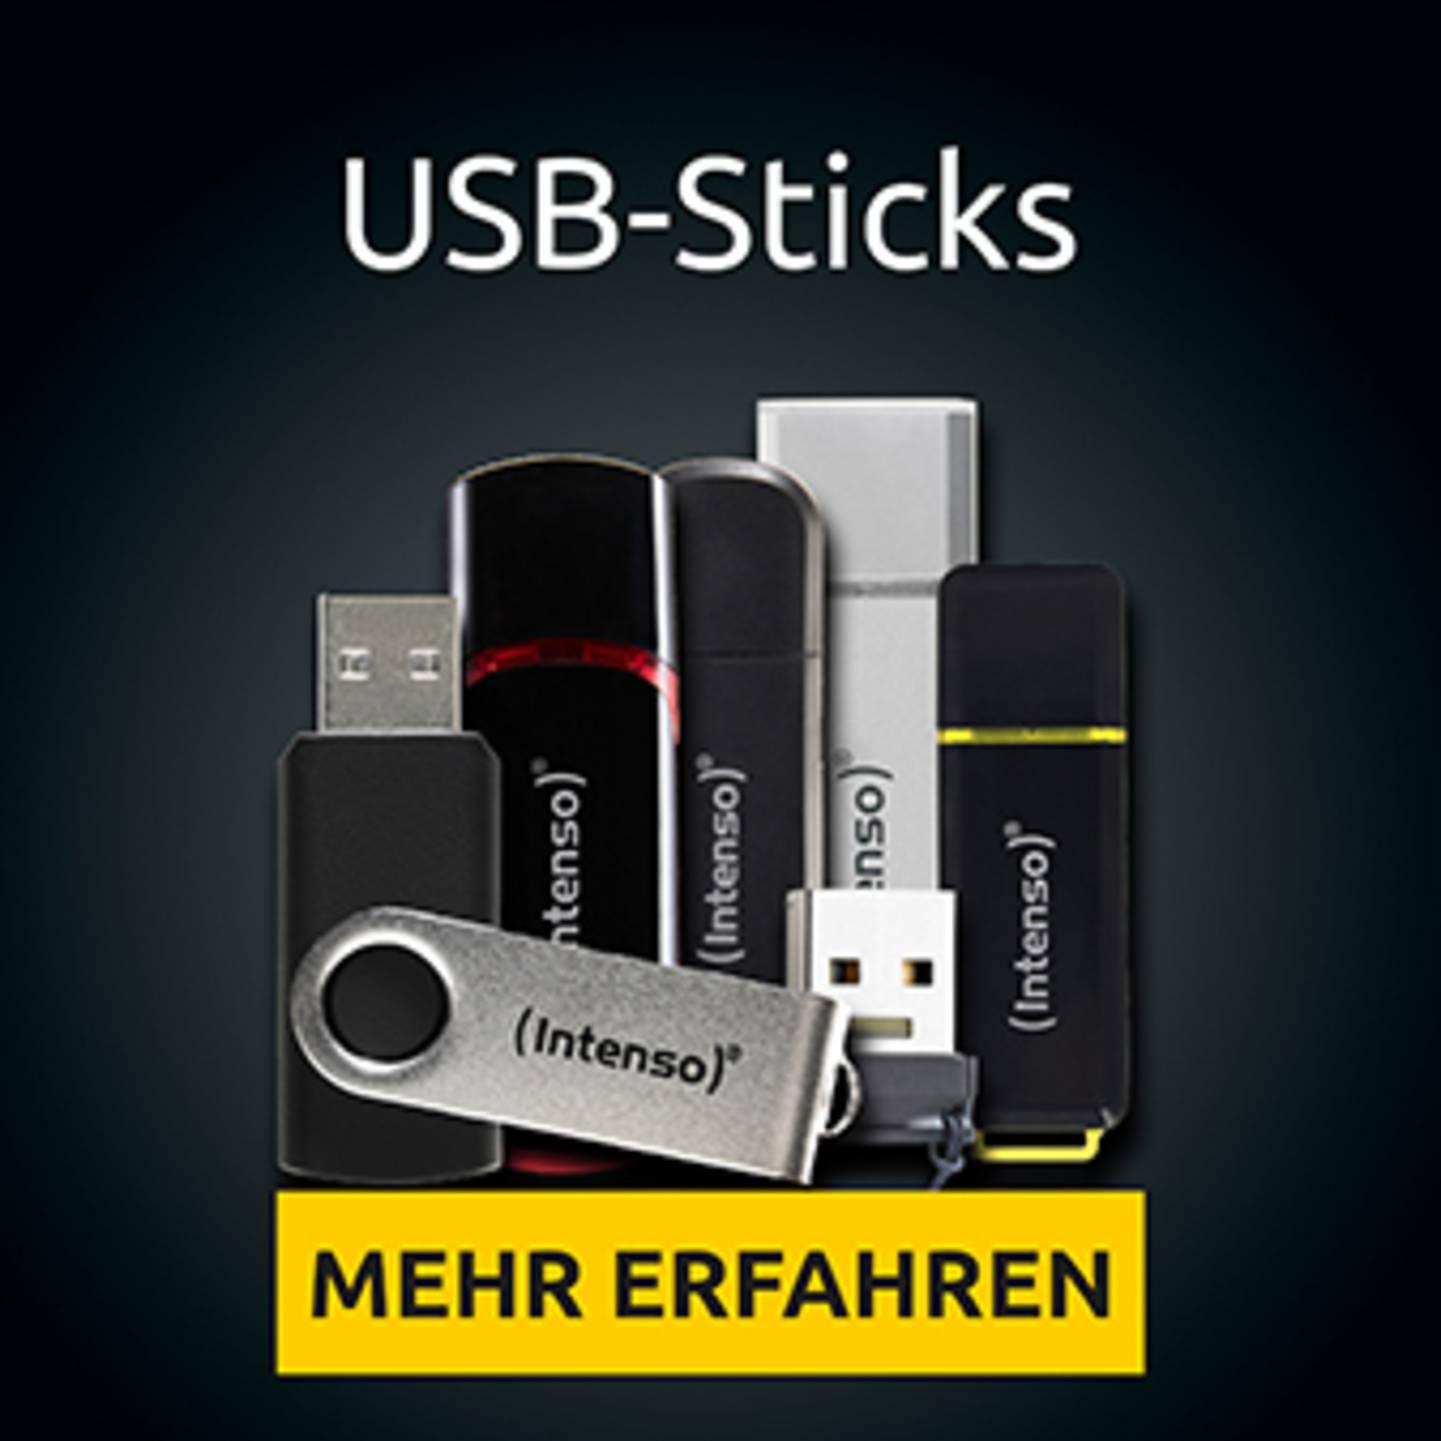 ubs sticks